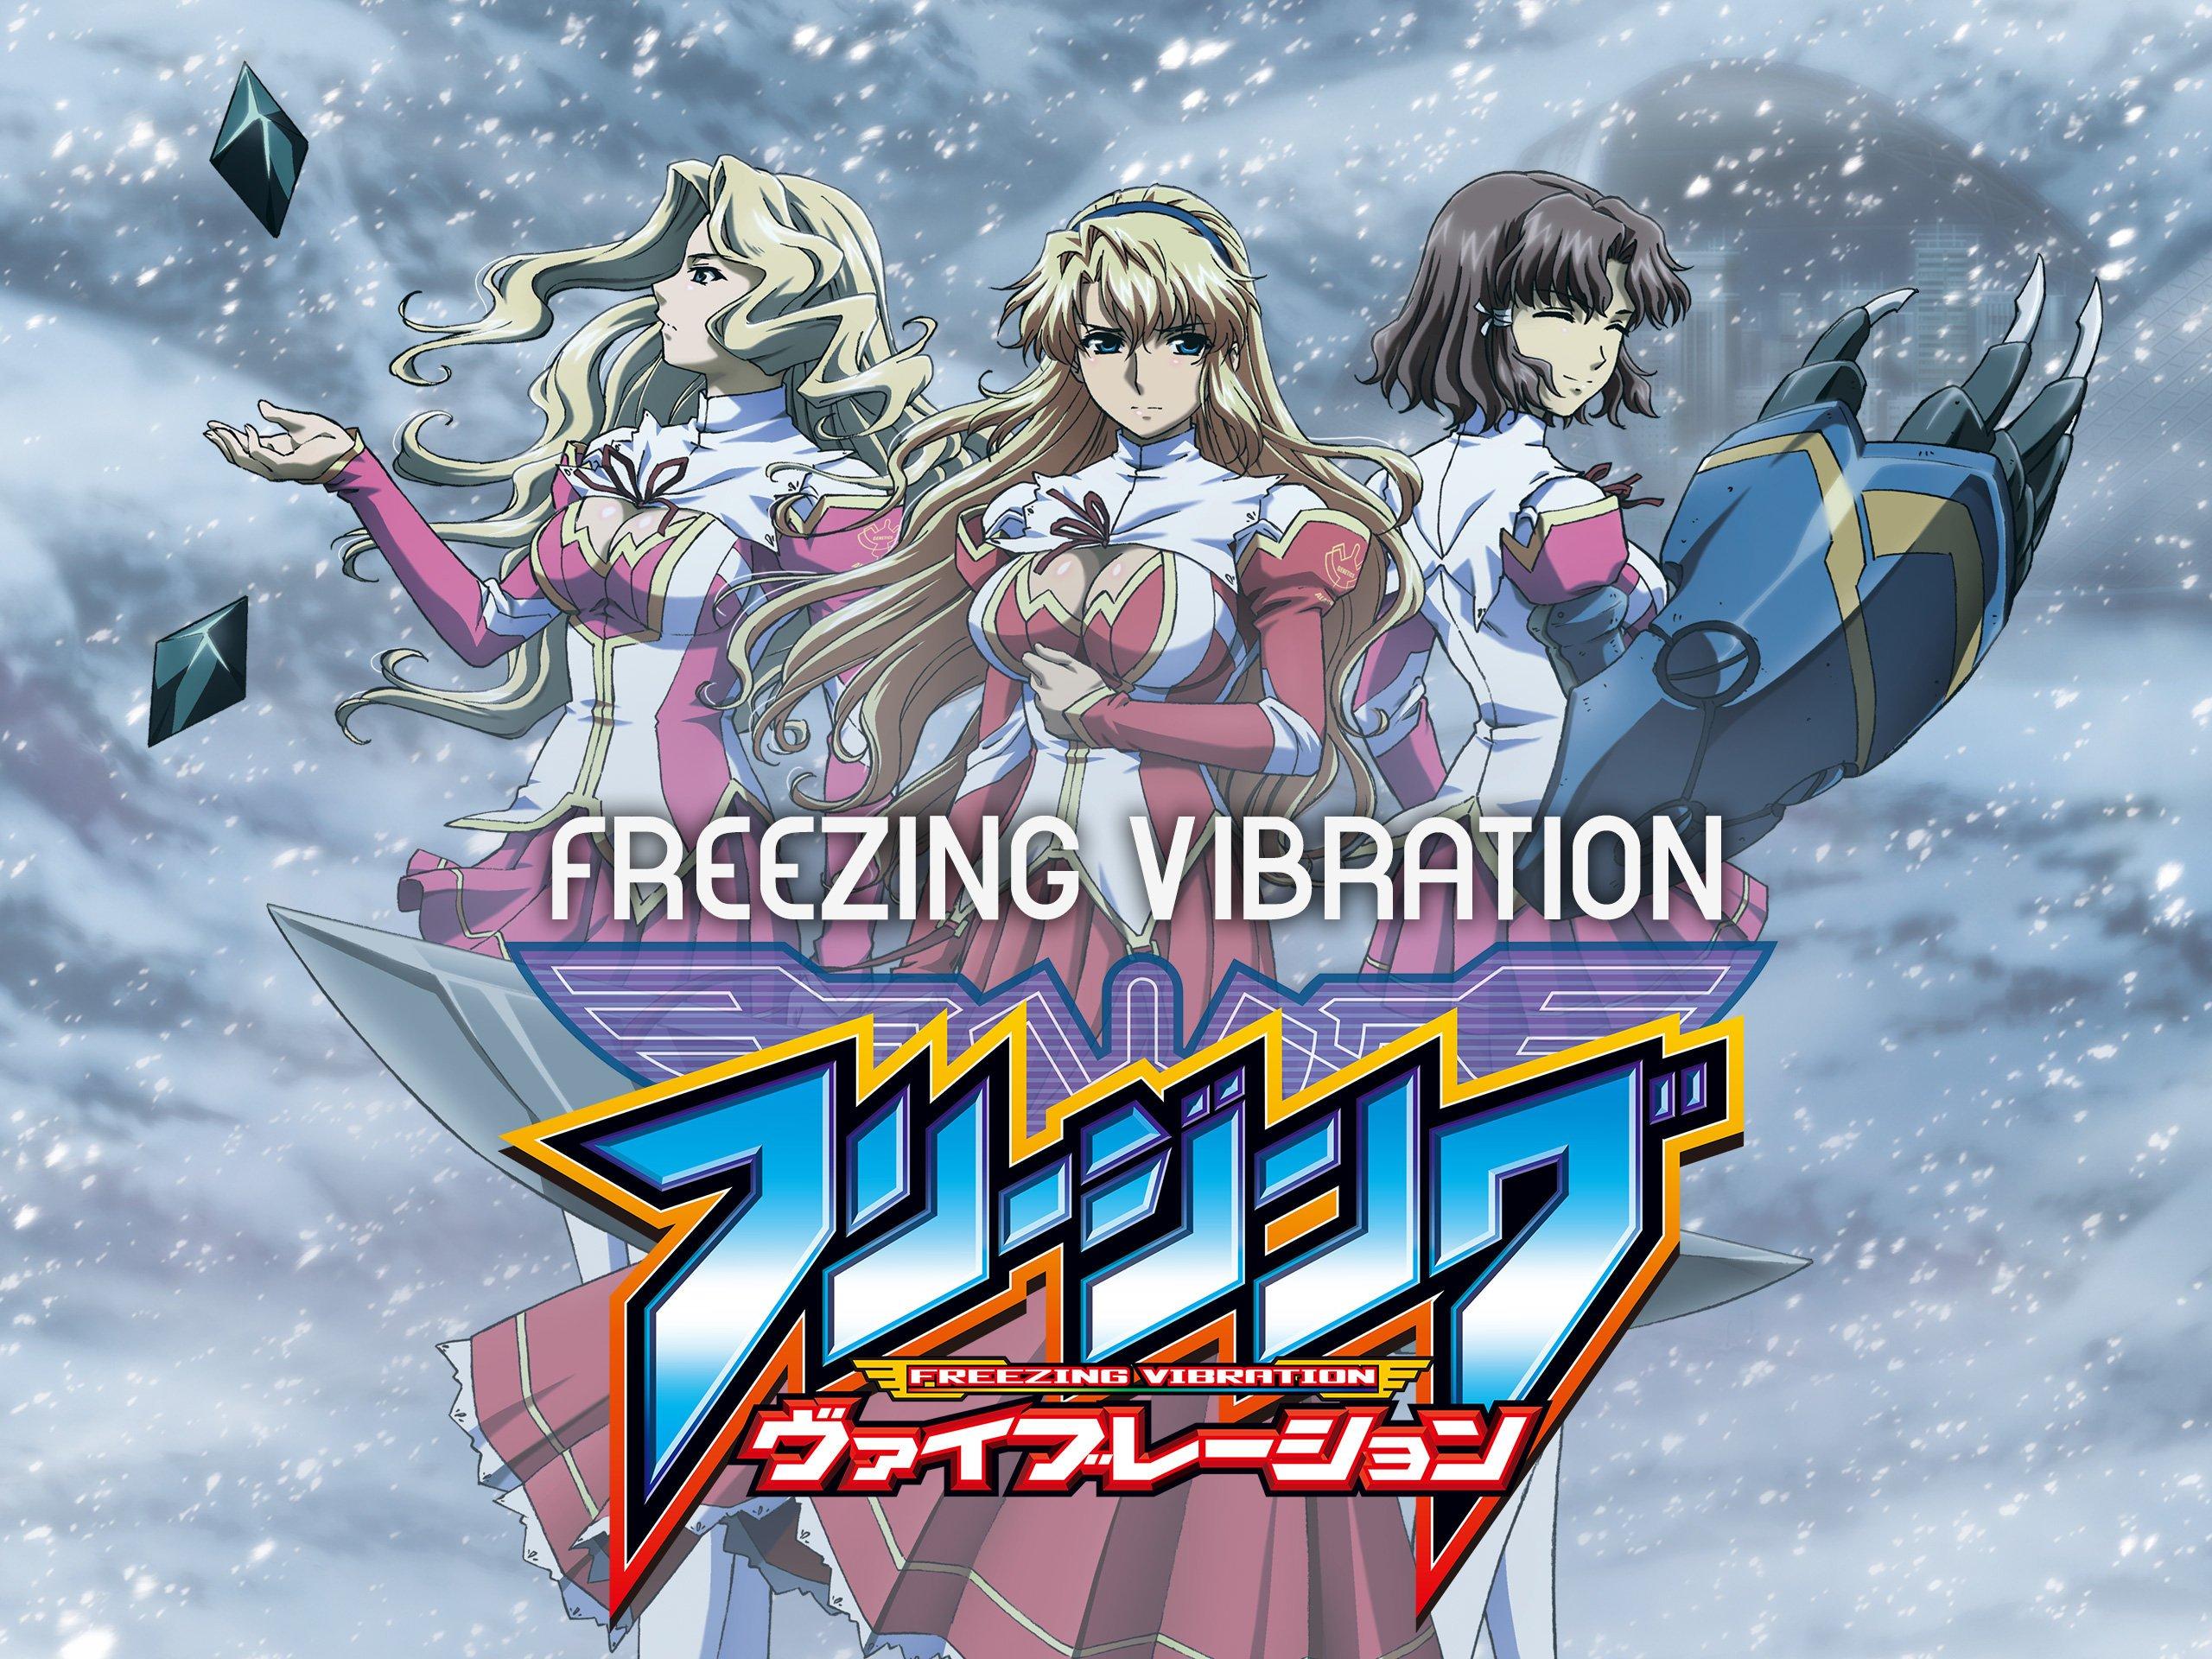 Amazon Freezing Vibration Digital Services LLC